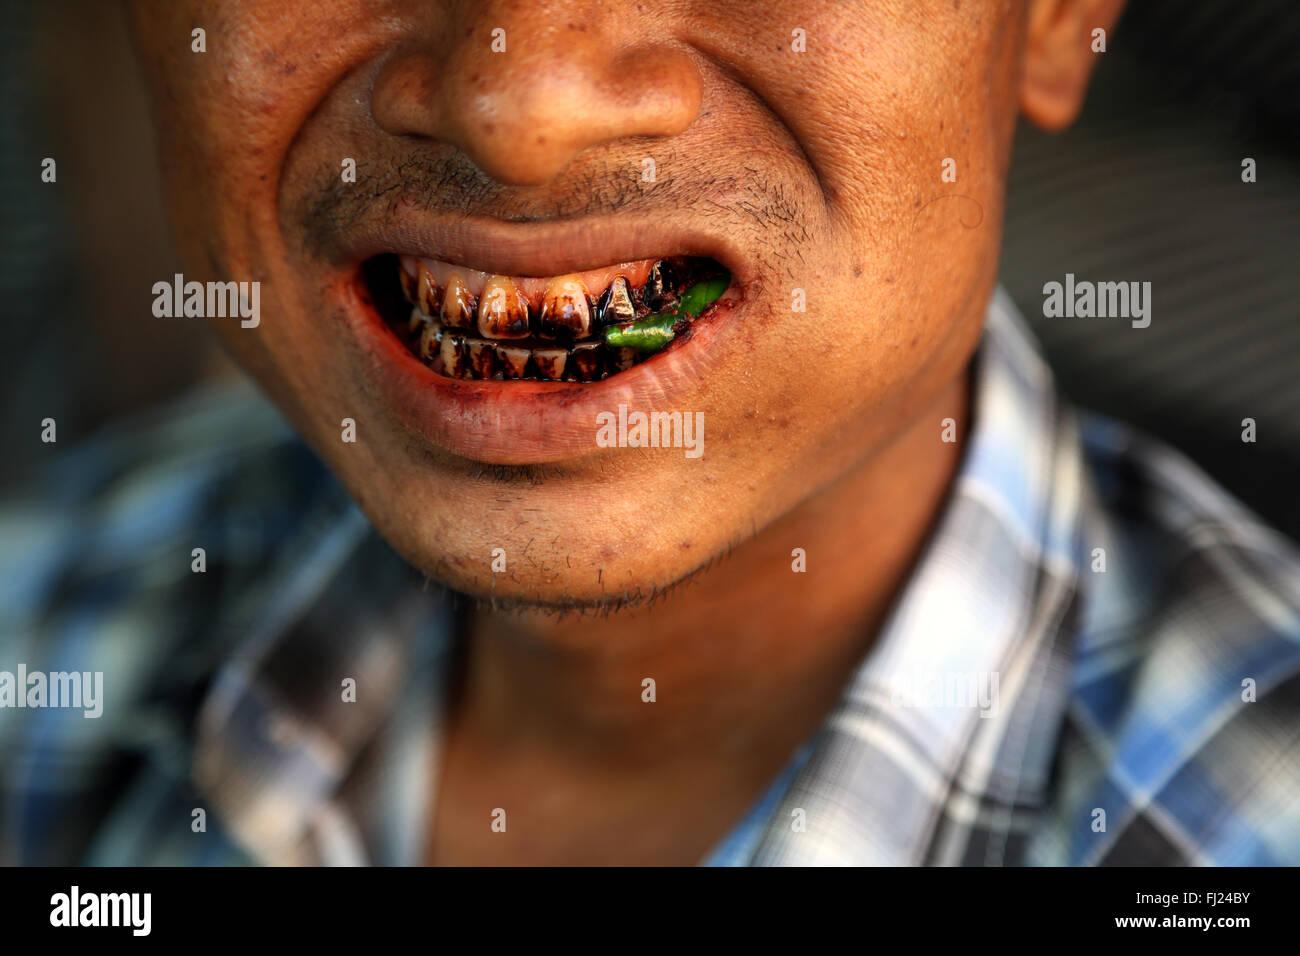 Man chewing pan massala betel in the streets of Rangoon Myanmar - Stock Image